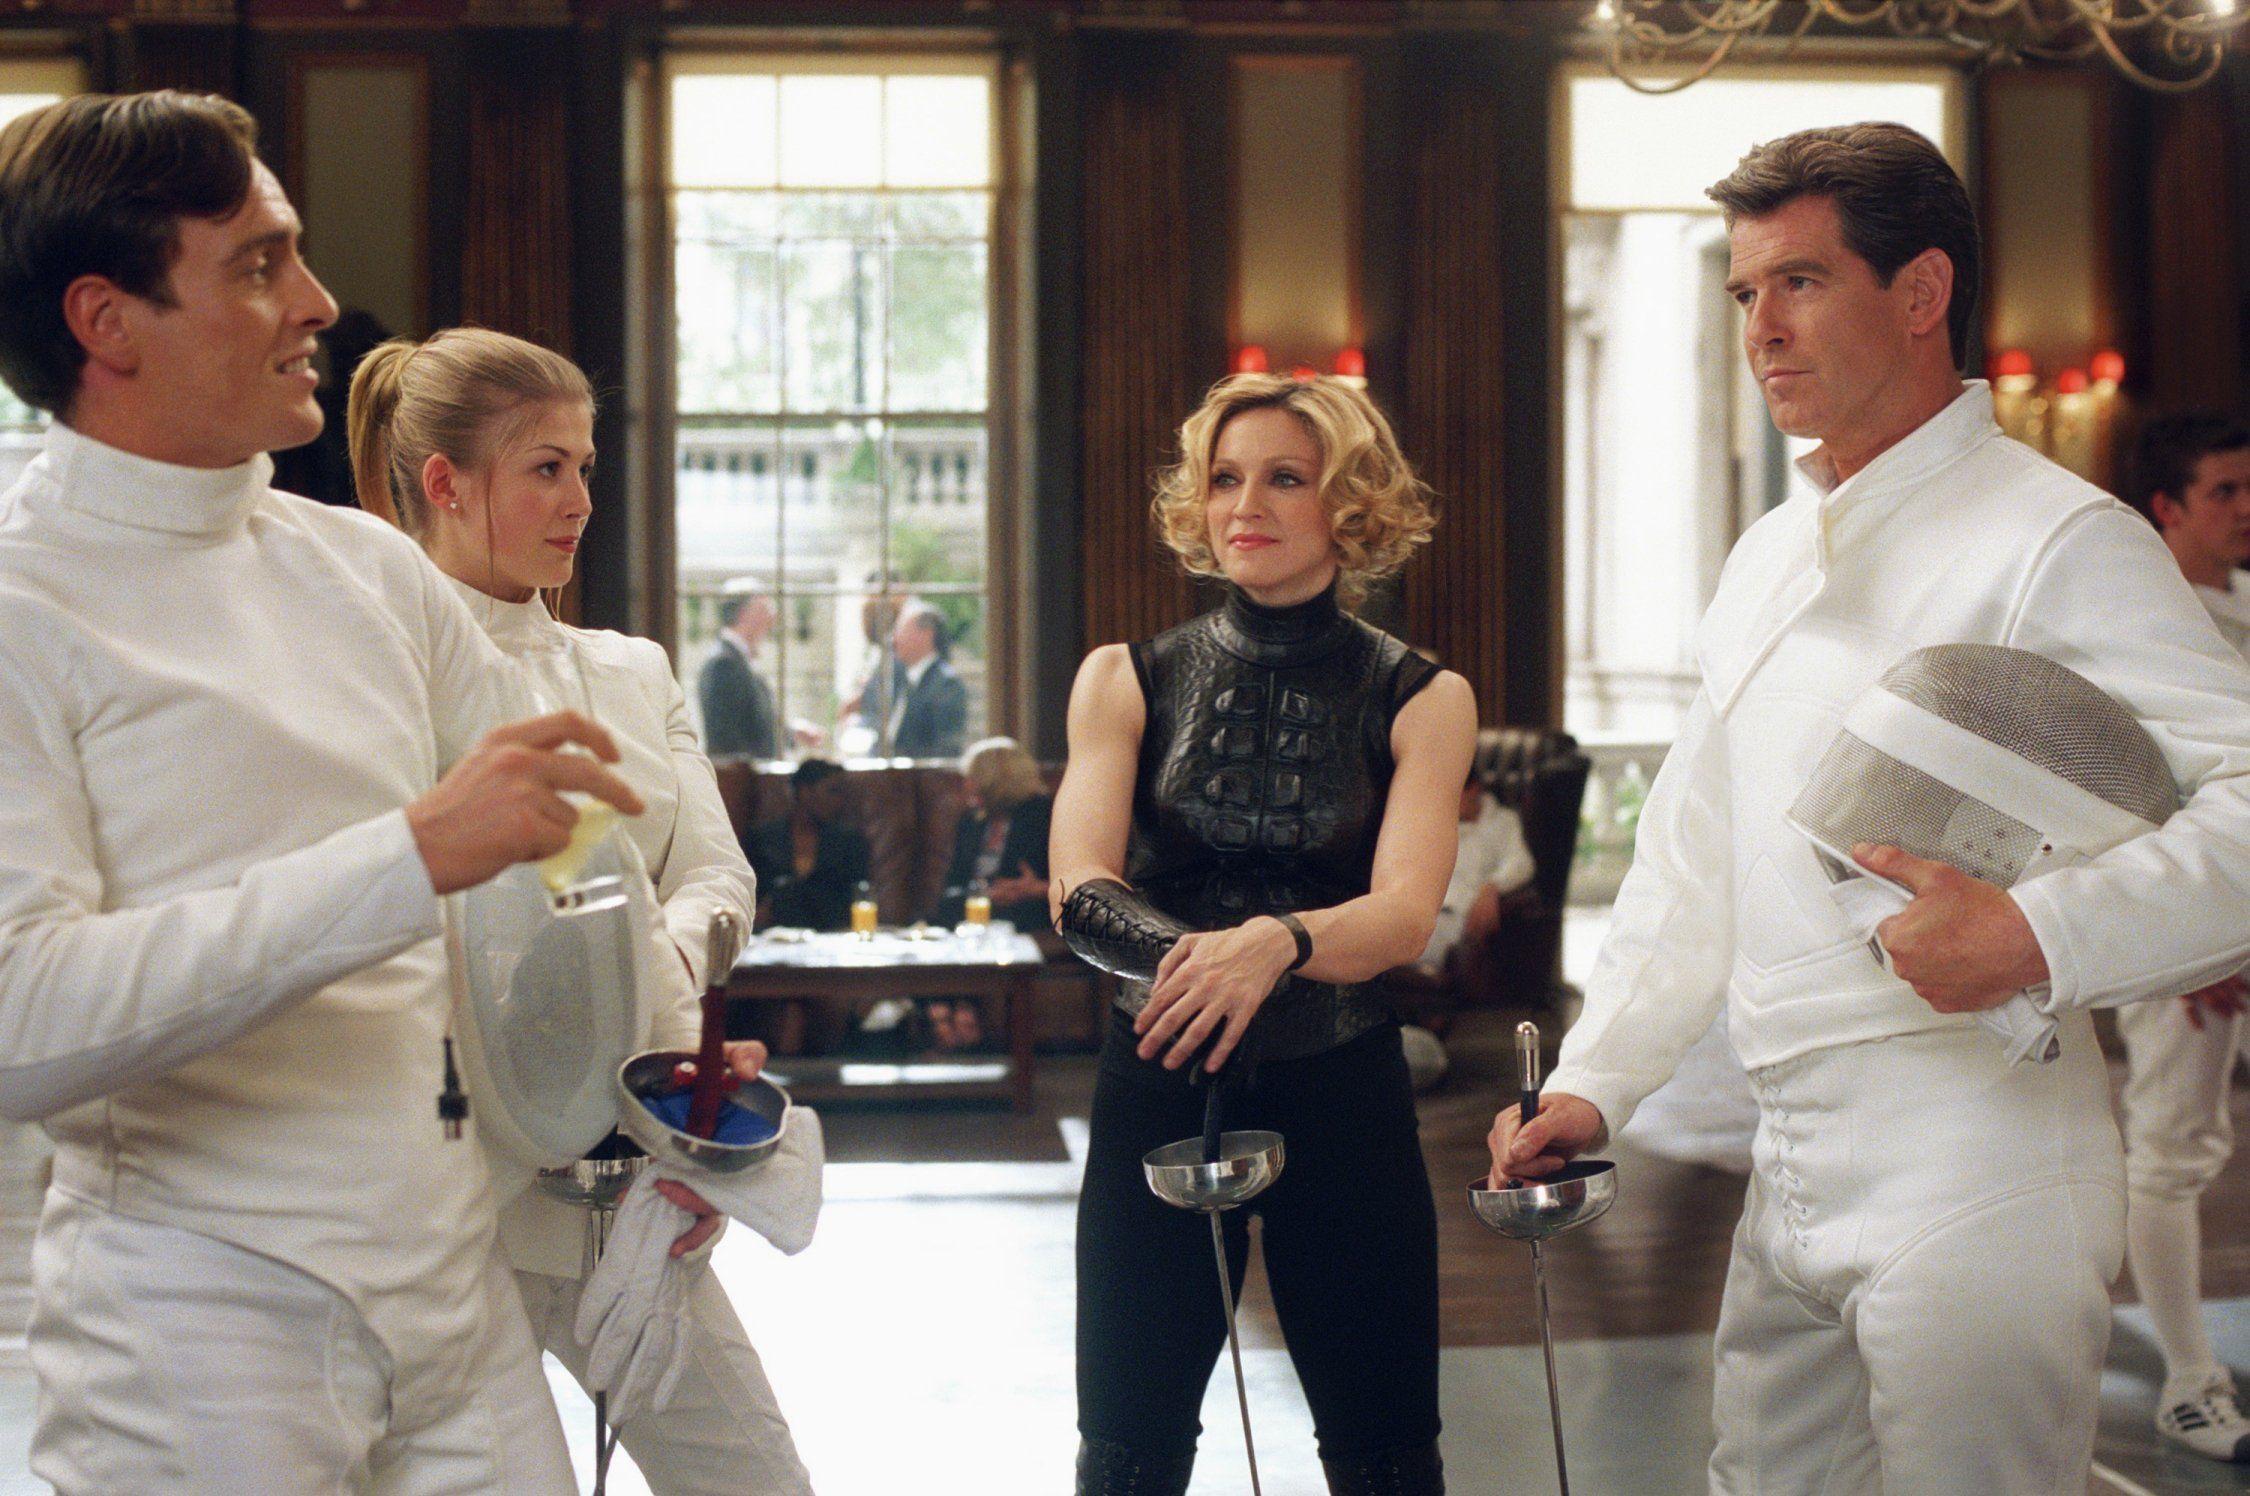 Rosamond Pike In Die Anothr Day Next To Madonna And Pierce Brosnan